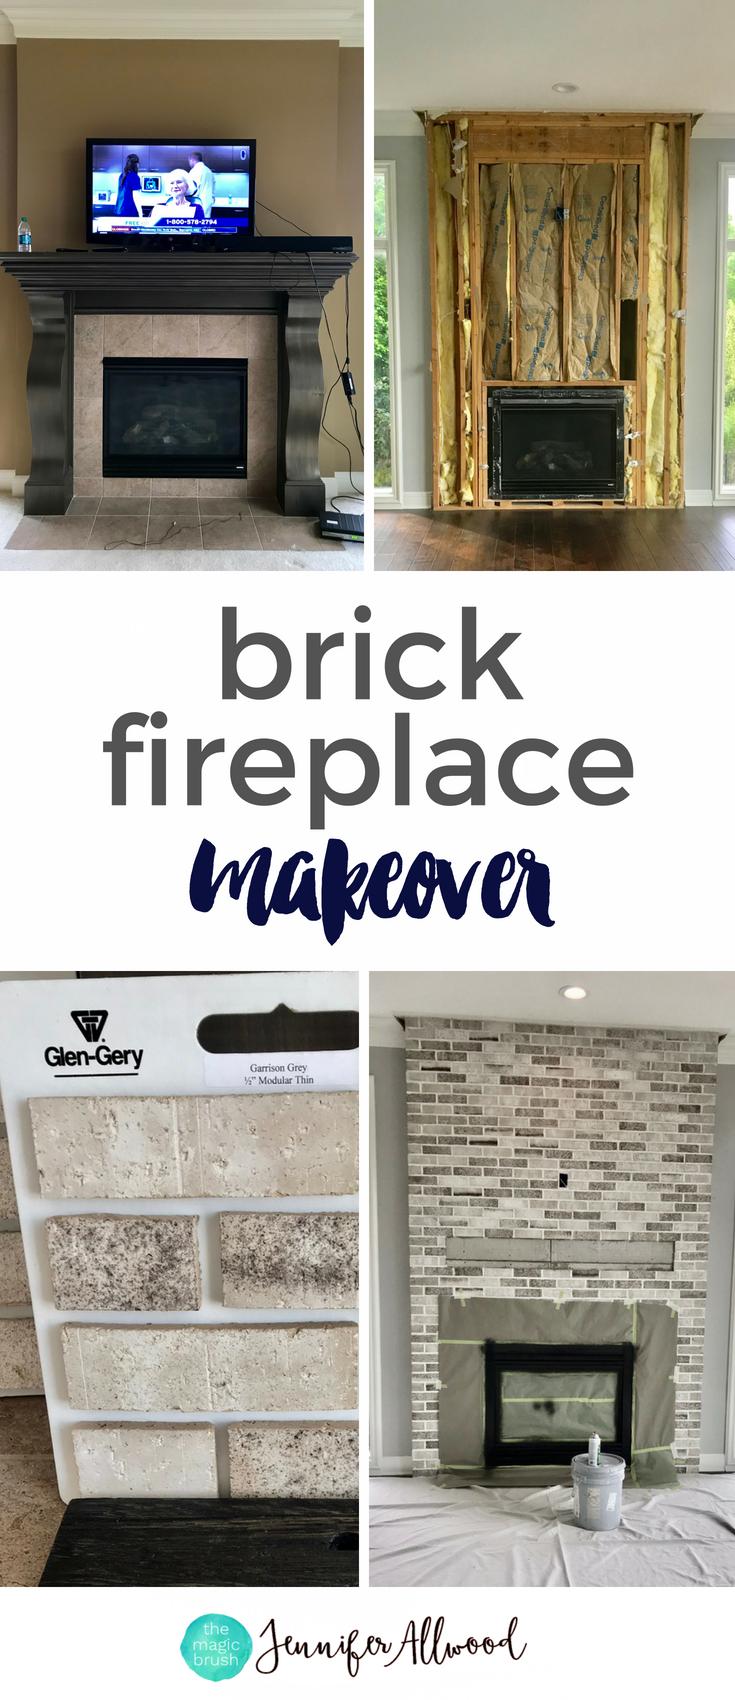 A Light Brick Fireplace Makeover By Jennifer Allwood The Magic